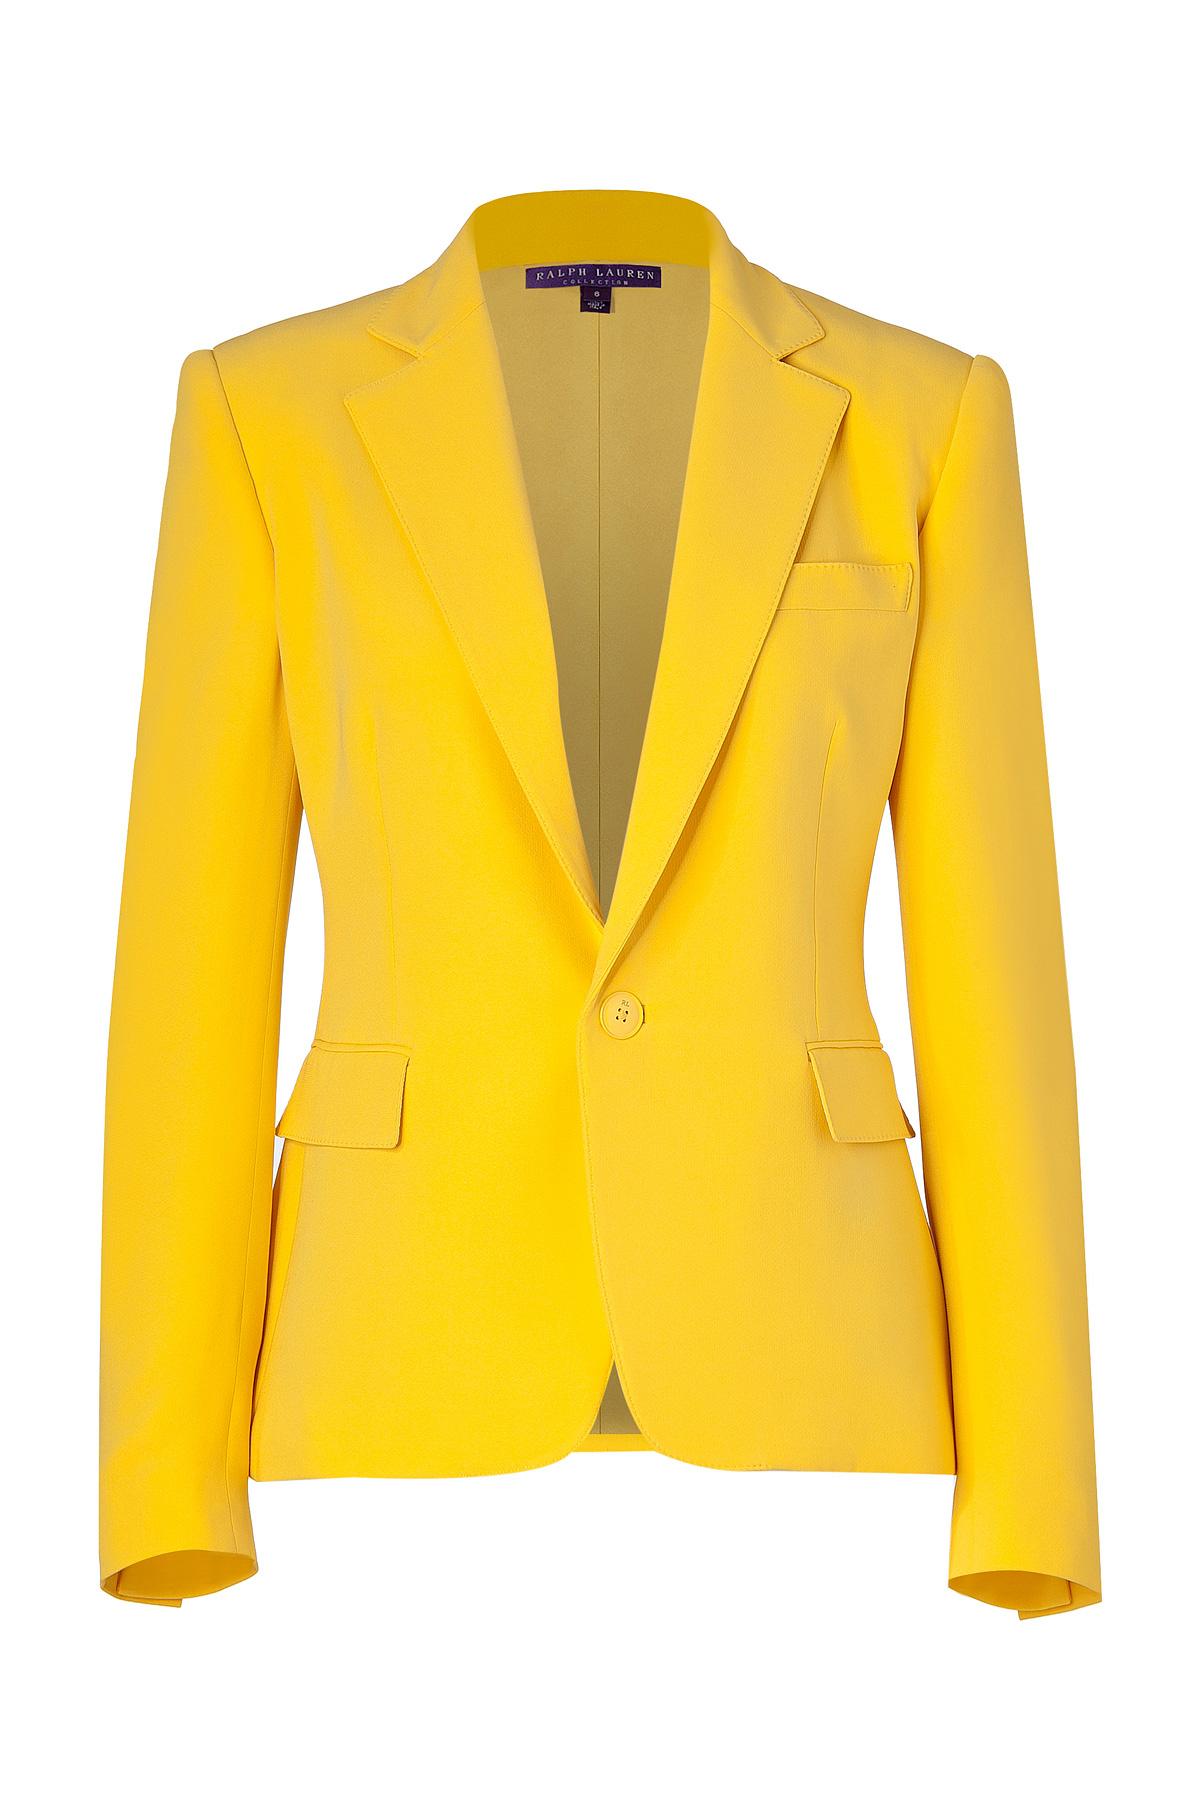 Ralph Lauren Collection Yellow Silk Cady Keaton Blazer In Yellow | Lyst